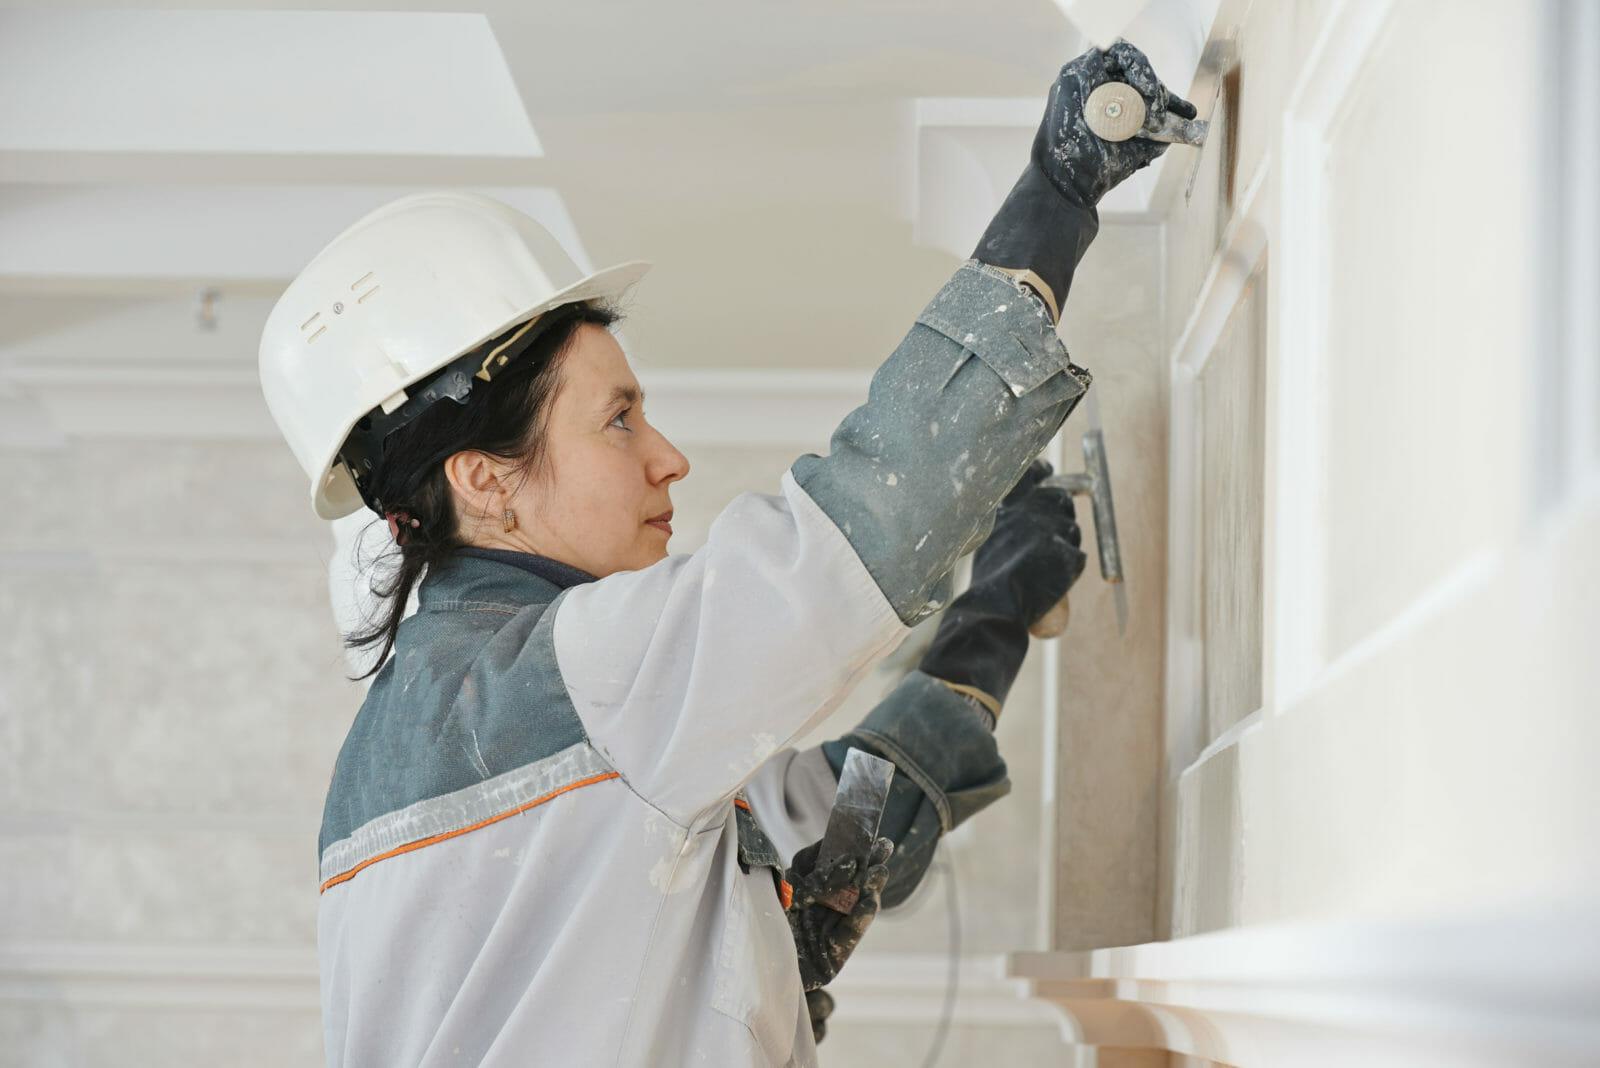 Woman restores plasterwork on wall